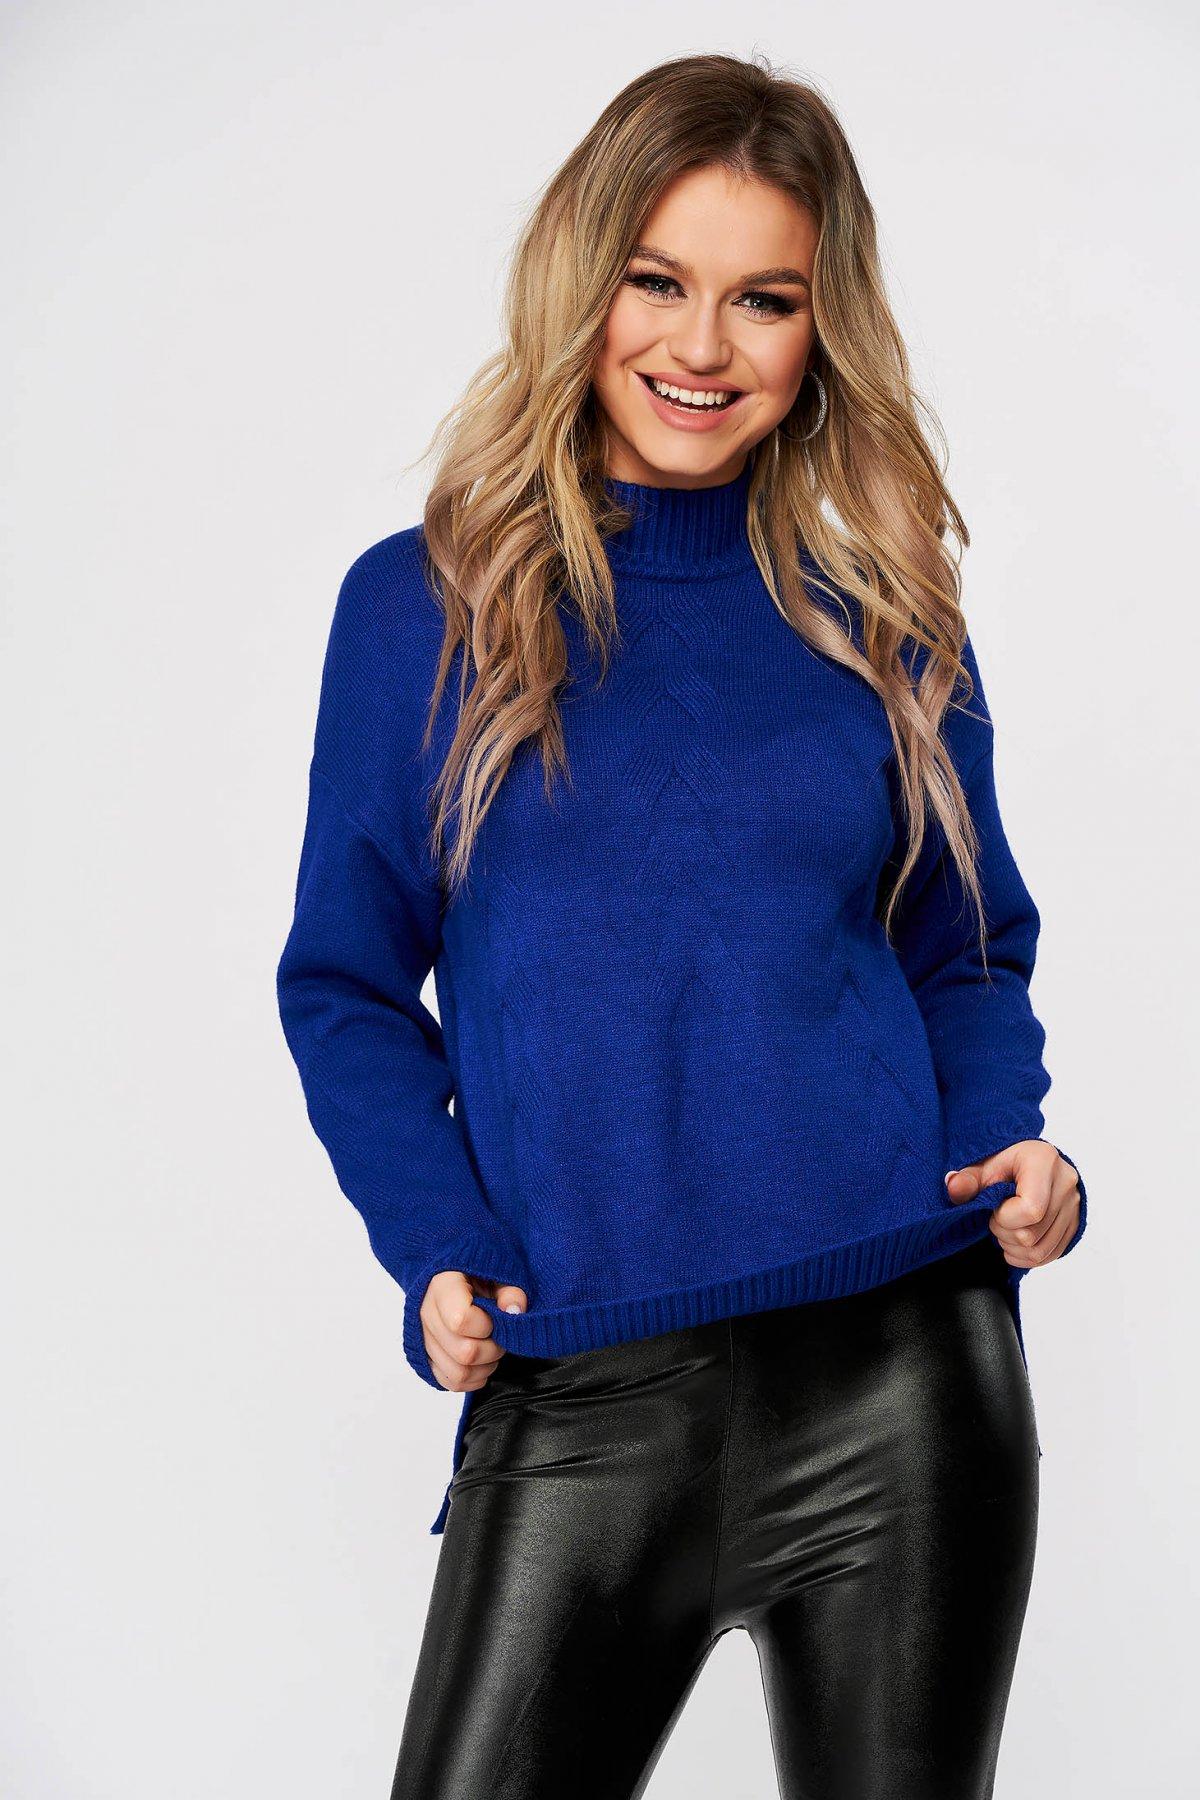 Pulover SunShine albastru casual scurt cu croi larg din material tricotat imagine